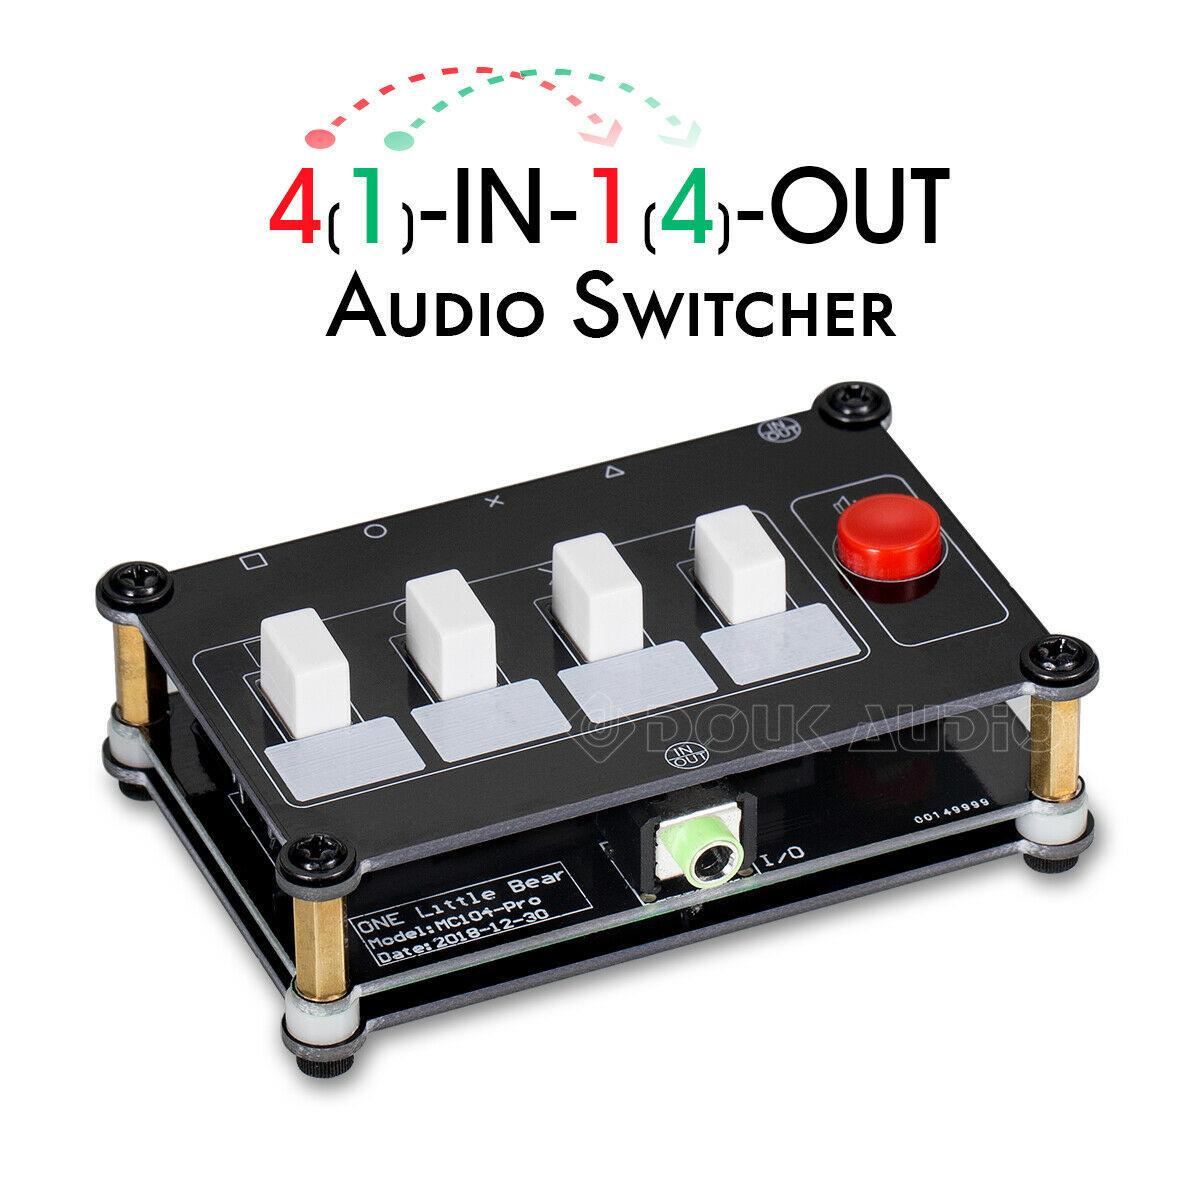 Little Bear Mini 4 (1)-EM-1 (4) -OUT 3.5 milímetros de Áudio Switcher Selector Splitter Amplificador de Sinal Passivo